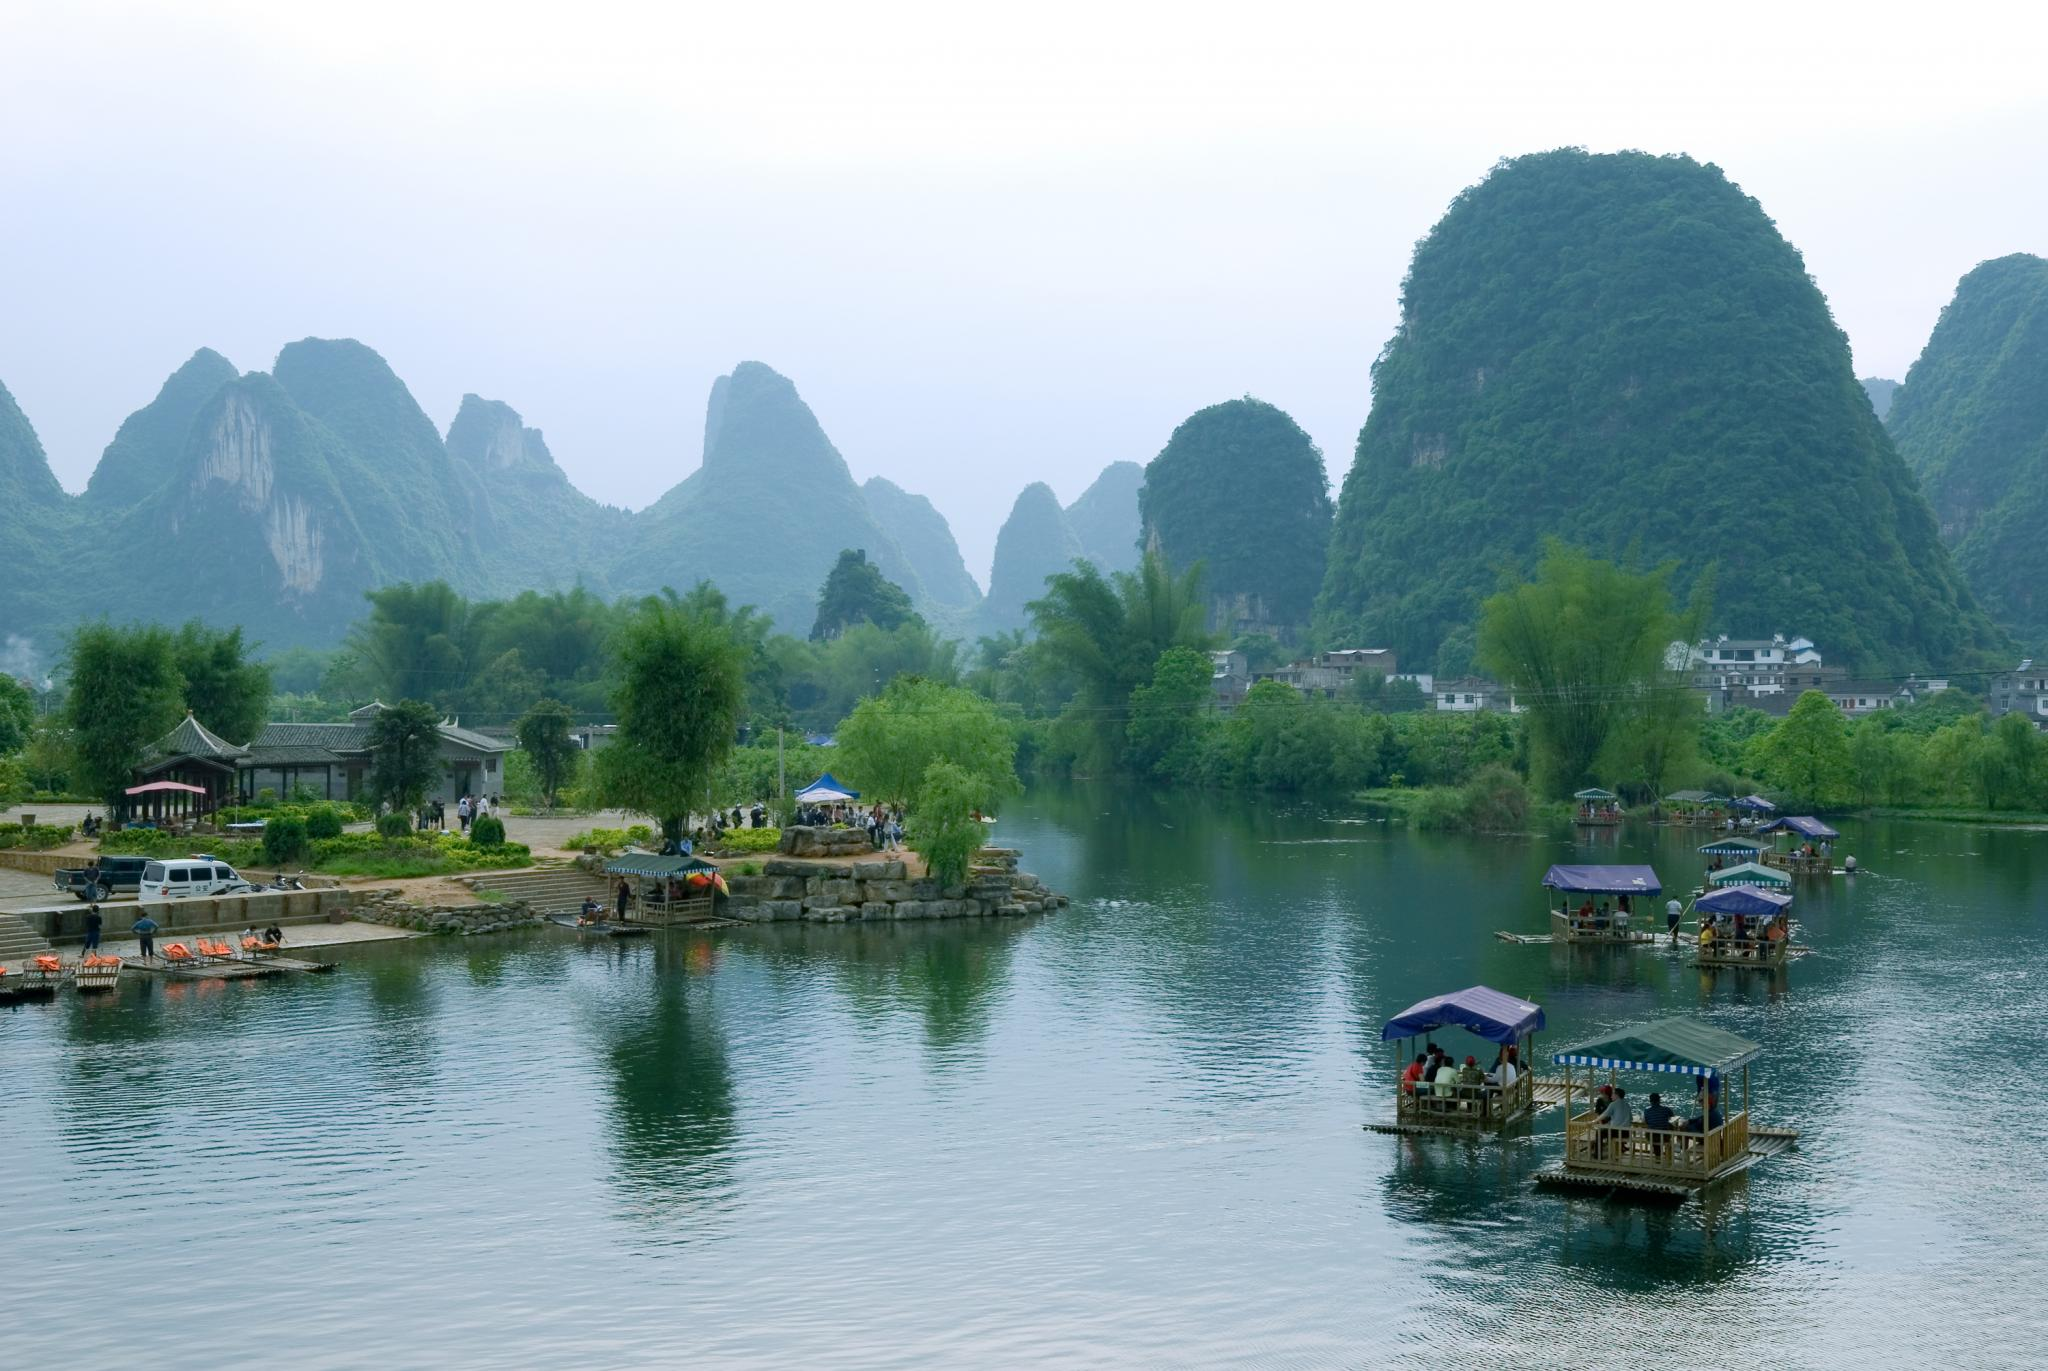 Luxury Tour Operator China